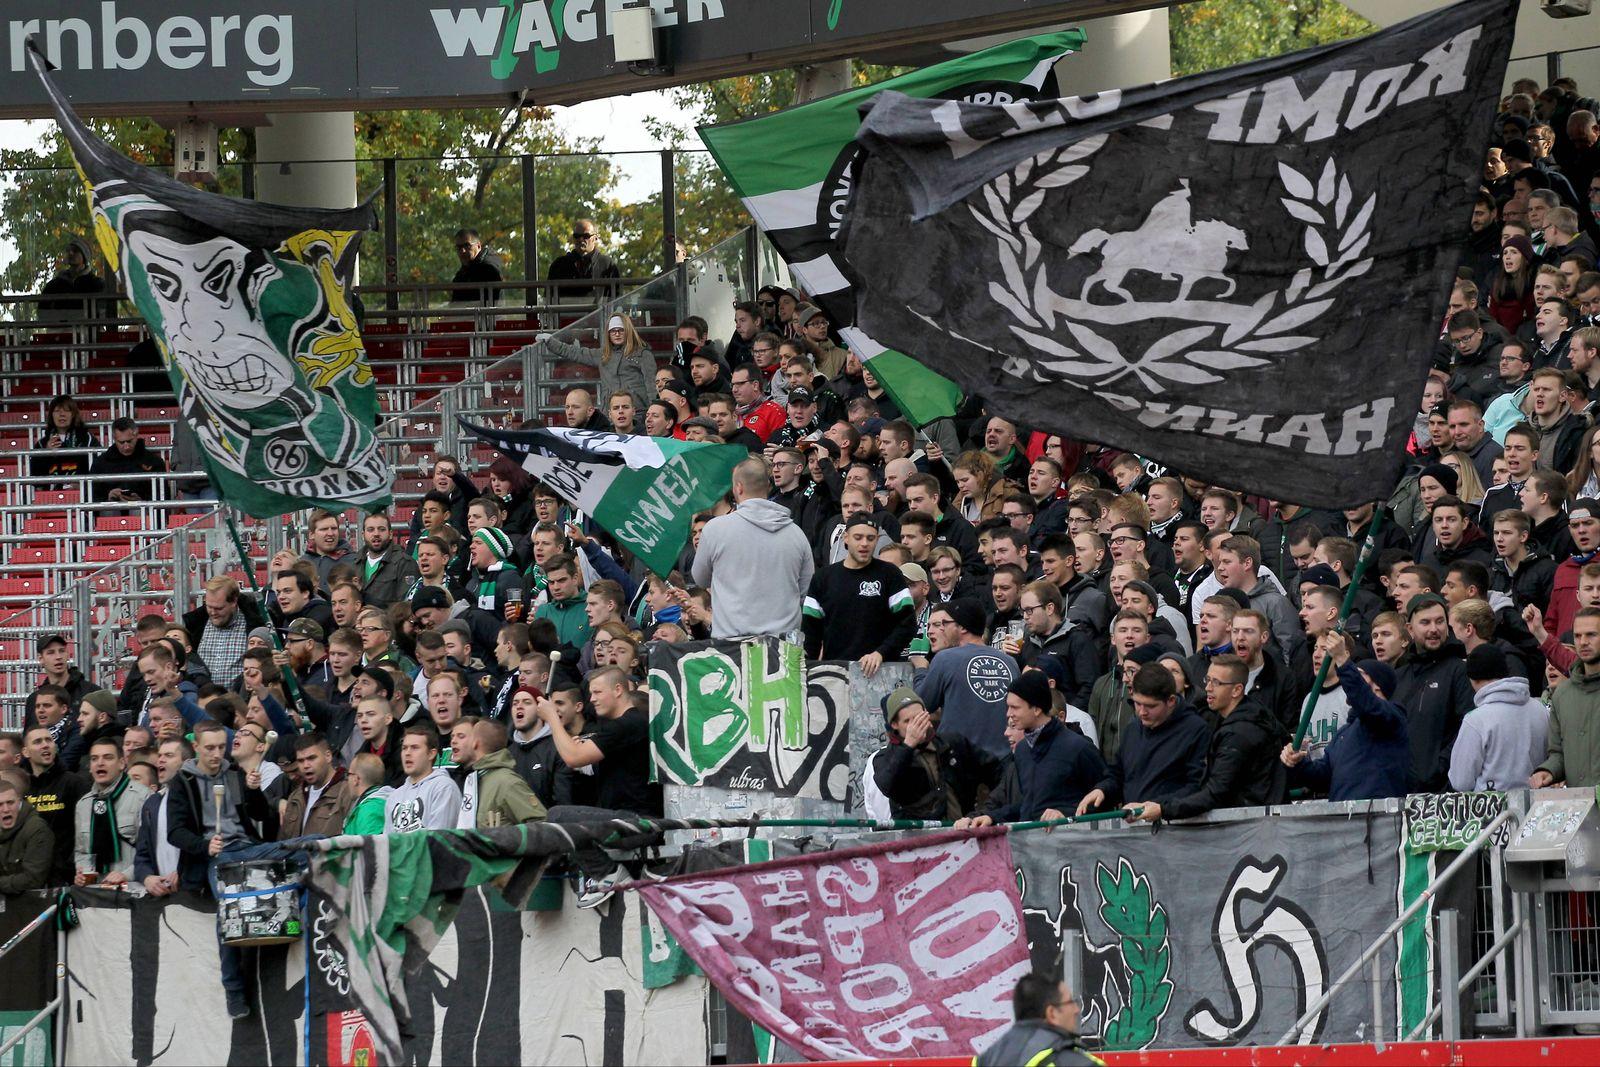 EINMALIGE VERWENDUNG Hannover / Nürnberg / Fahne Rising Boys